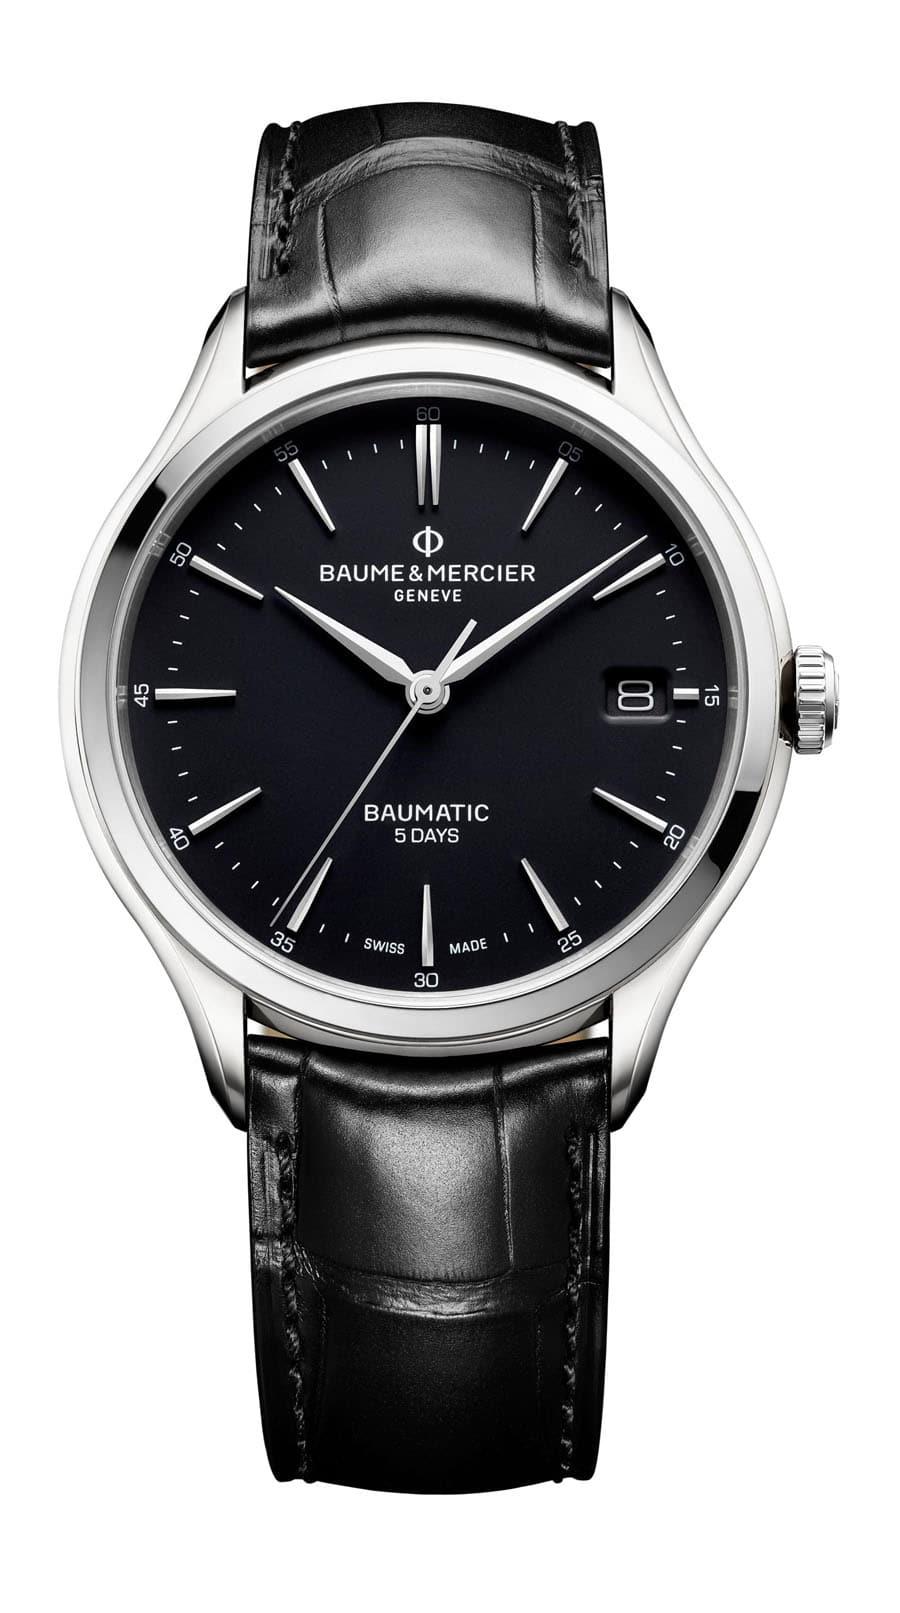 Baume & Mercier: Clifton Baumatic in Edelstahl mit schwarzem Lederband